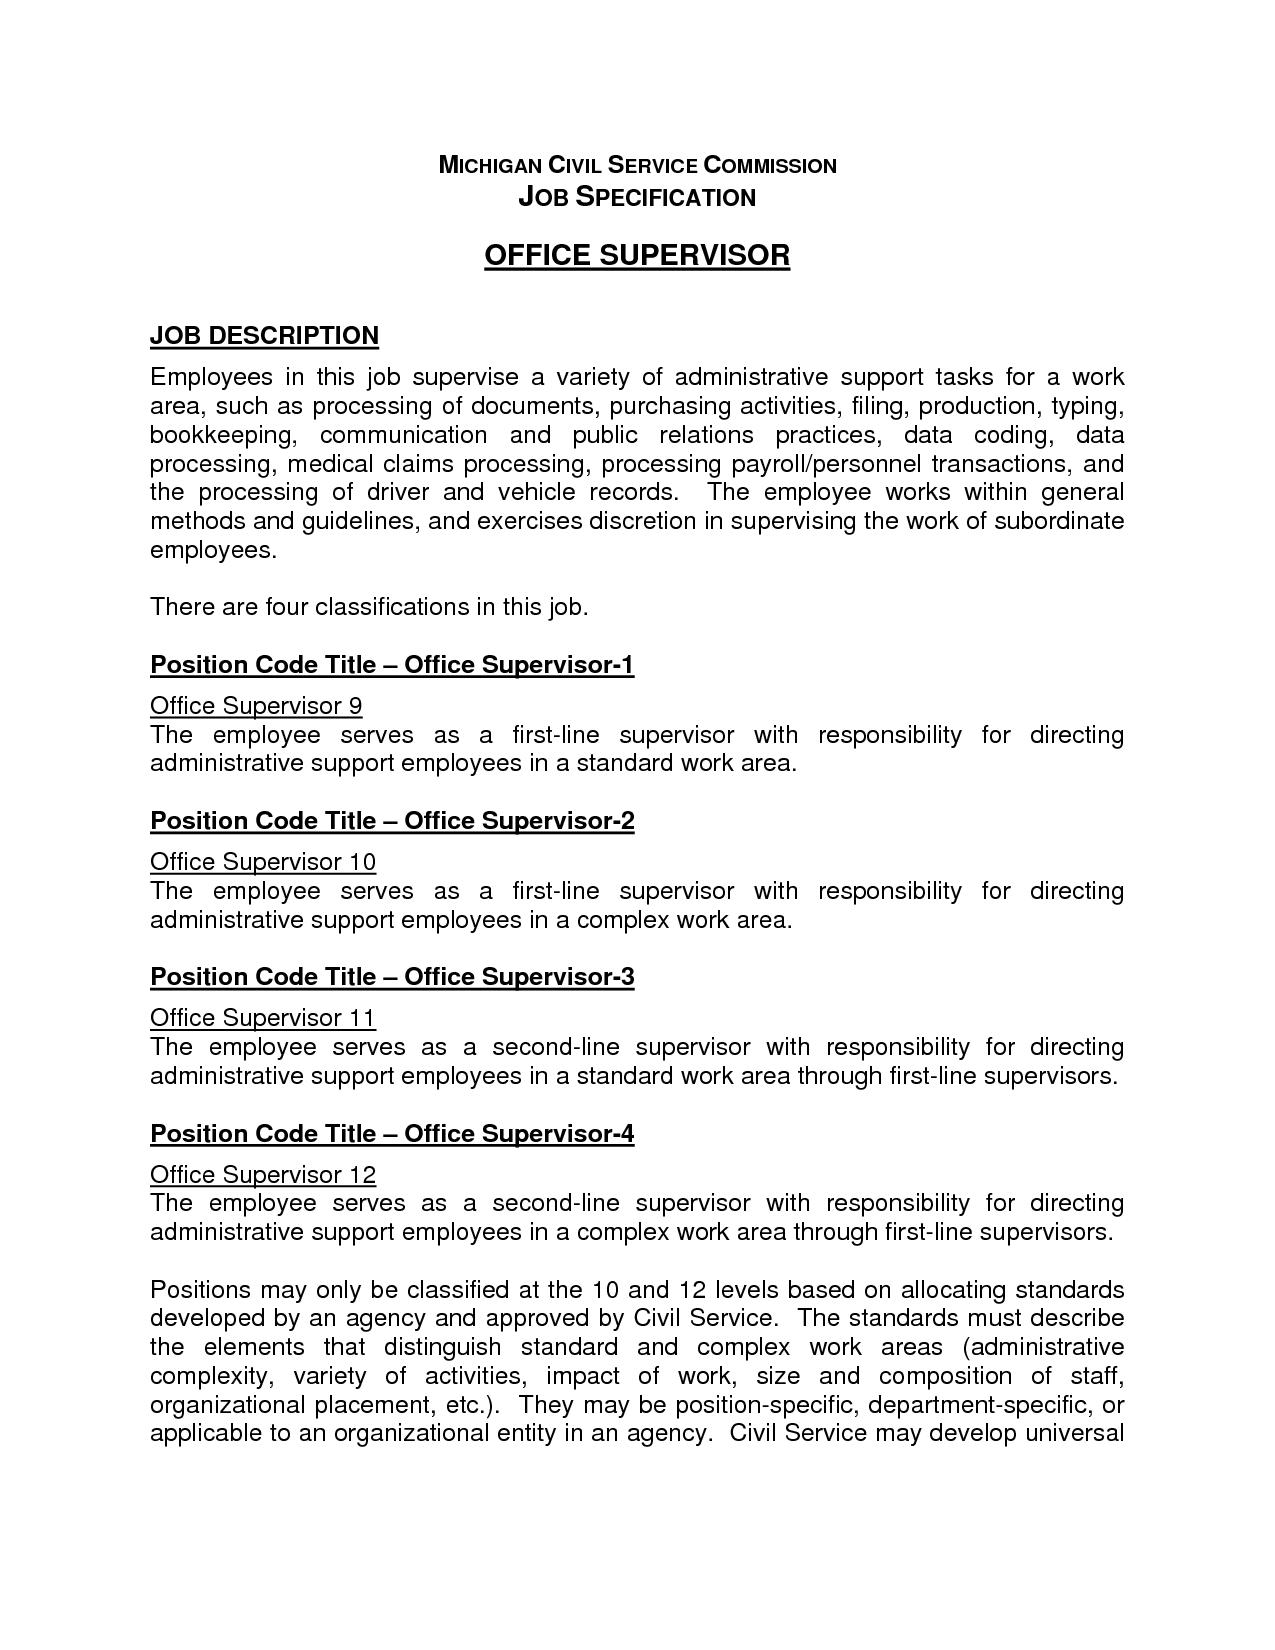 Office Administrator Job Description Check more at https